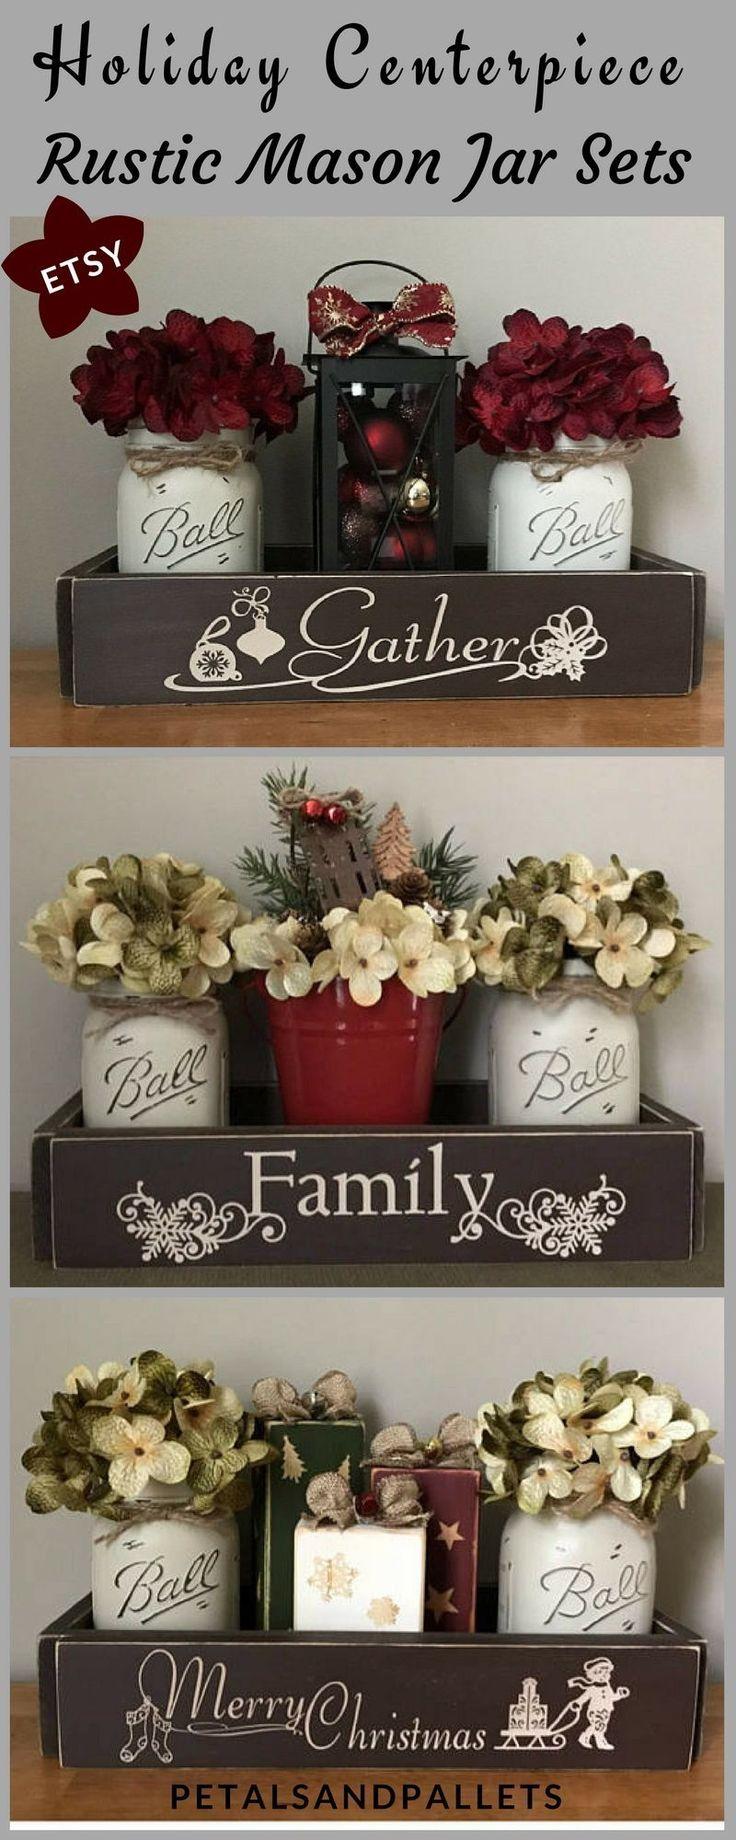 Mason Jar Christmas Centerpiece, Rustic Christmas Centerpieces, Farmhouse Christmas Decor, Winter Decor, Lantern Decor, Painted Mason Jars #ad